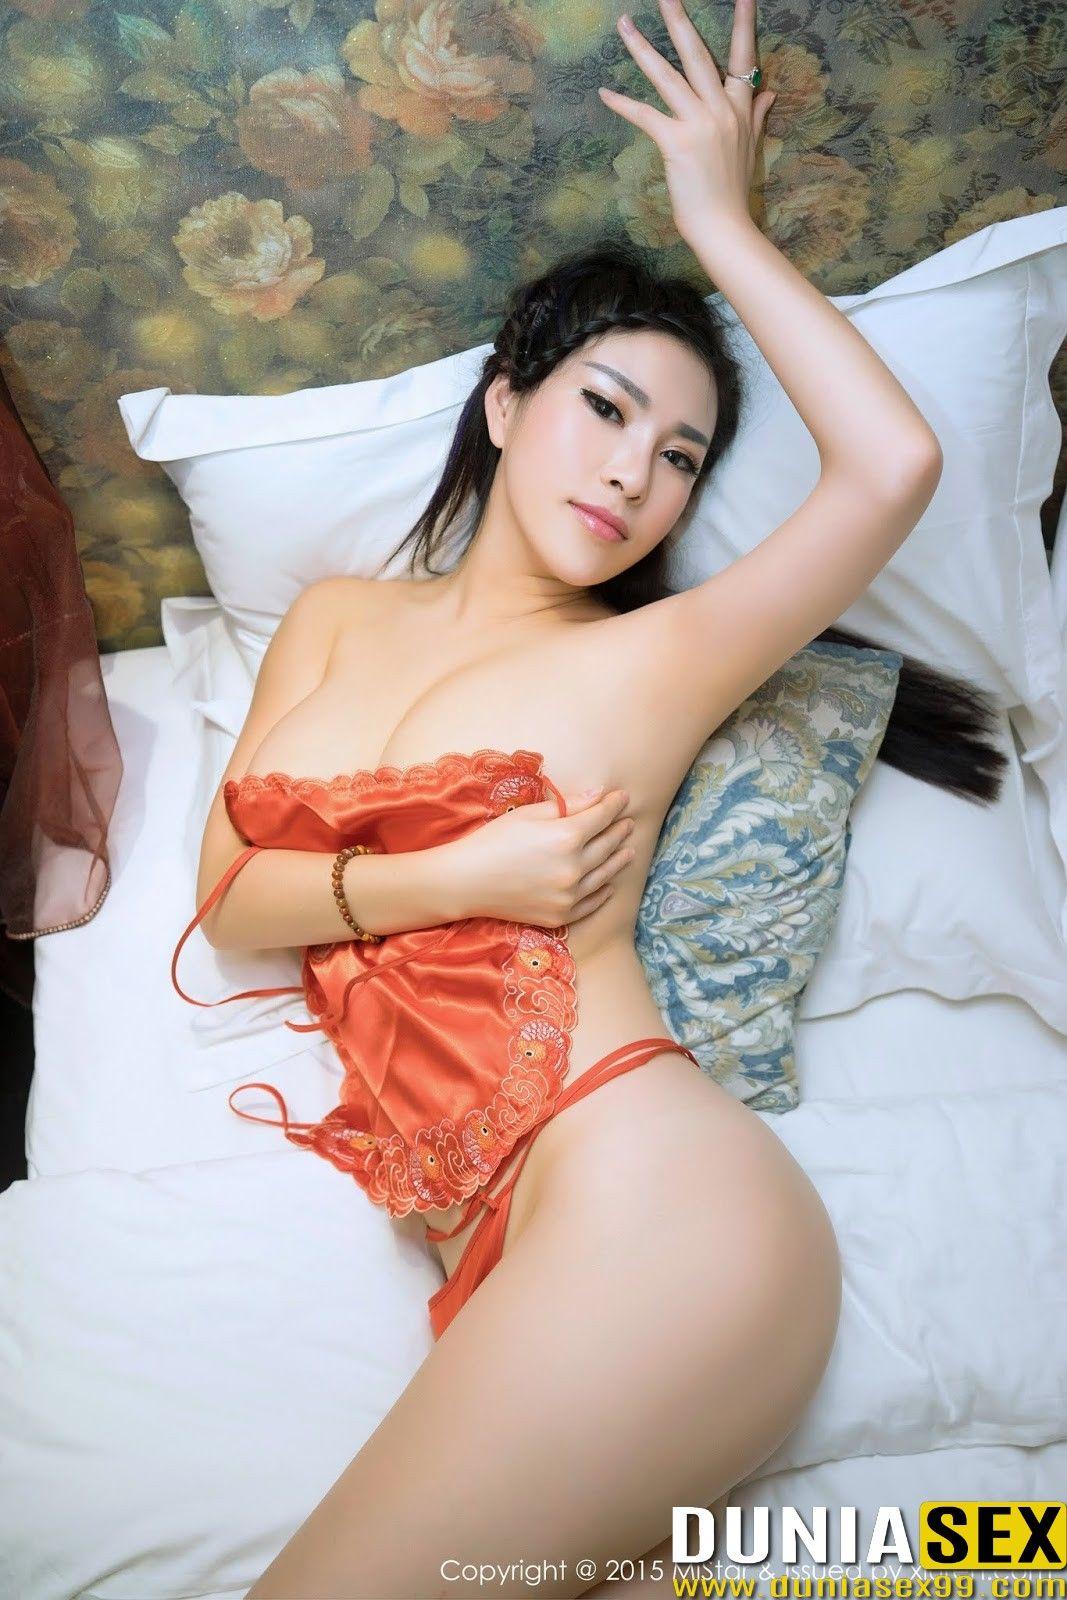 Agen Seks Cerita Dewasa Panas Cerita Hot Cerita Hot Sex Cerita Indo